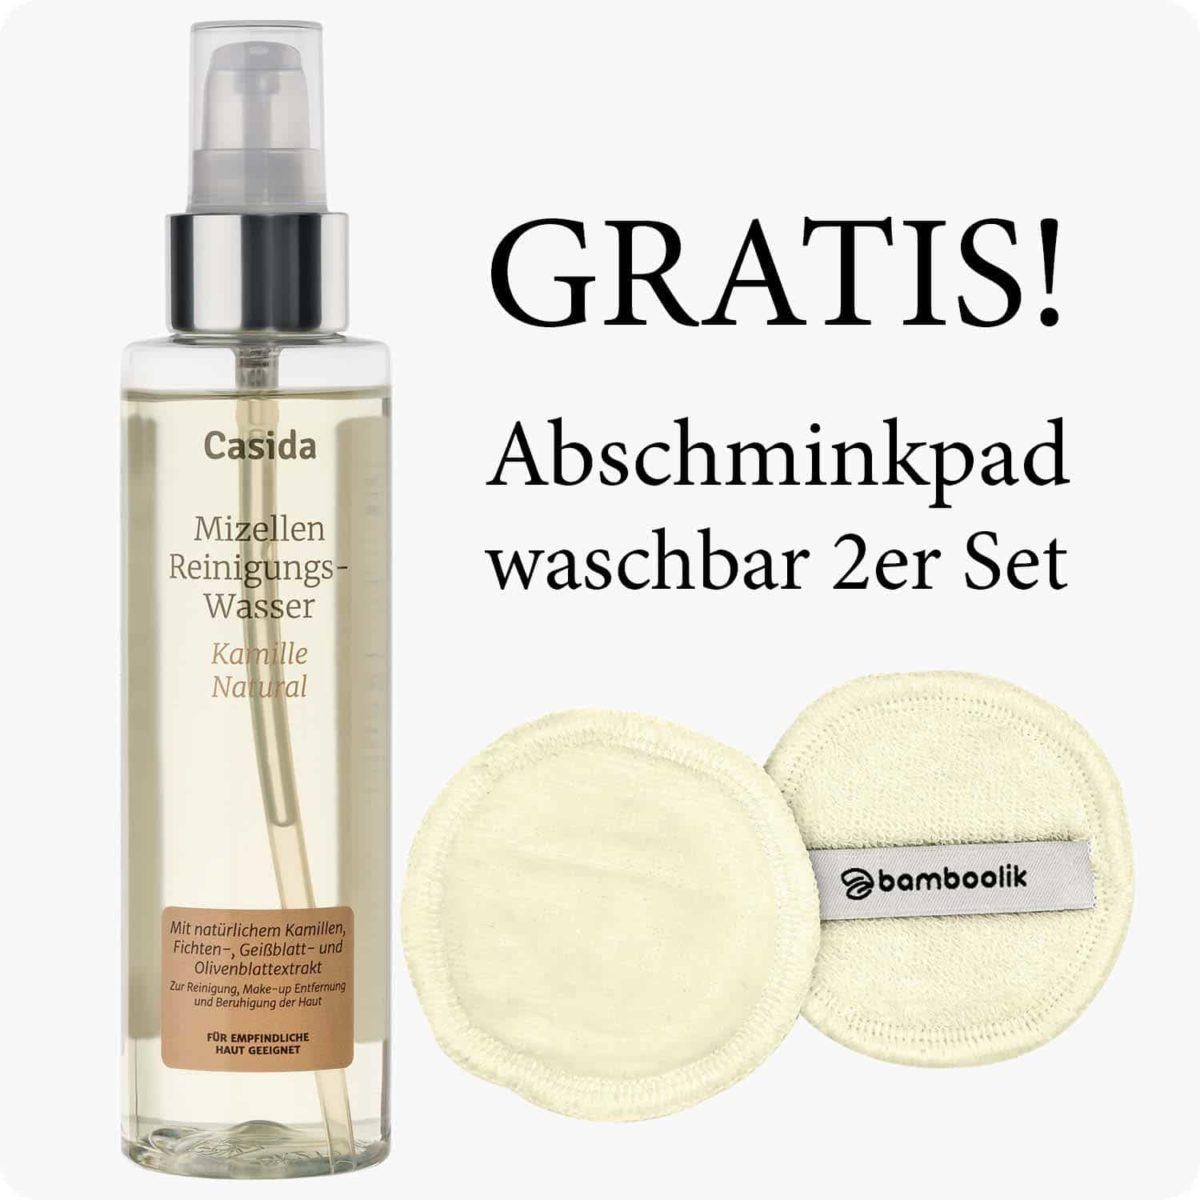 Casida Mizellenwasser Kamille Natural – 150 ml 15408238 PZN Apotheke Abschminken Make-up pflanzlich